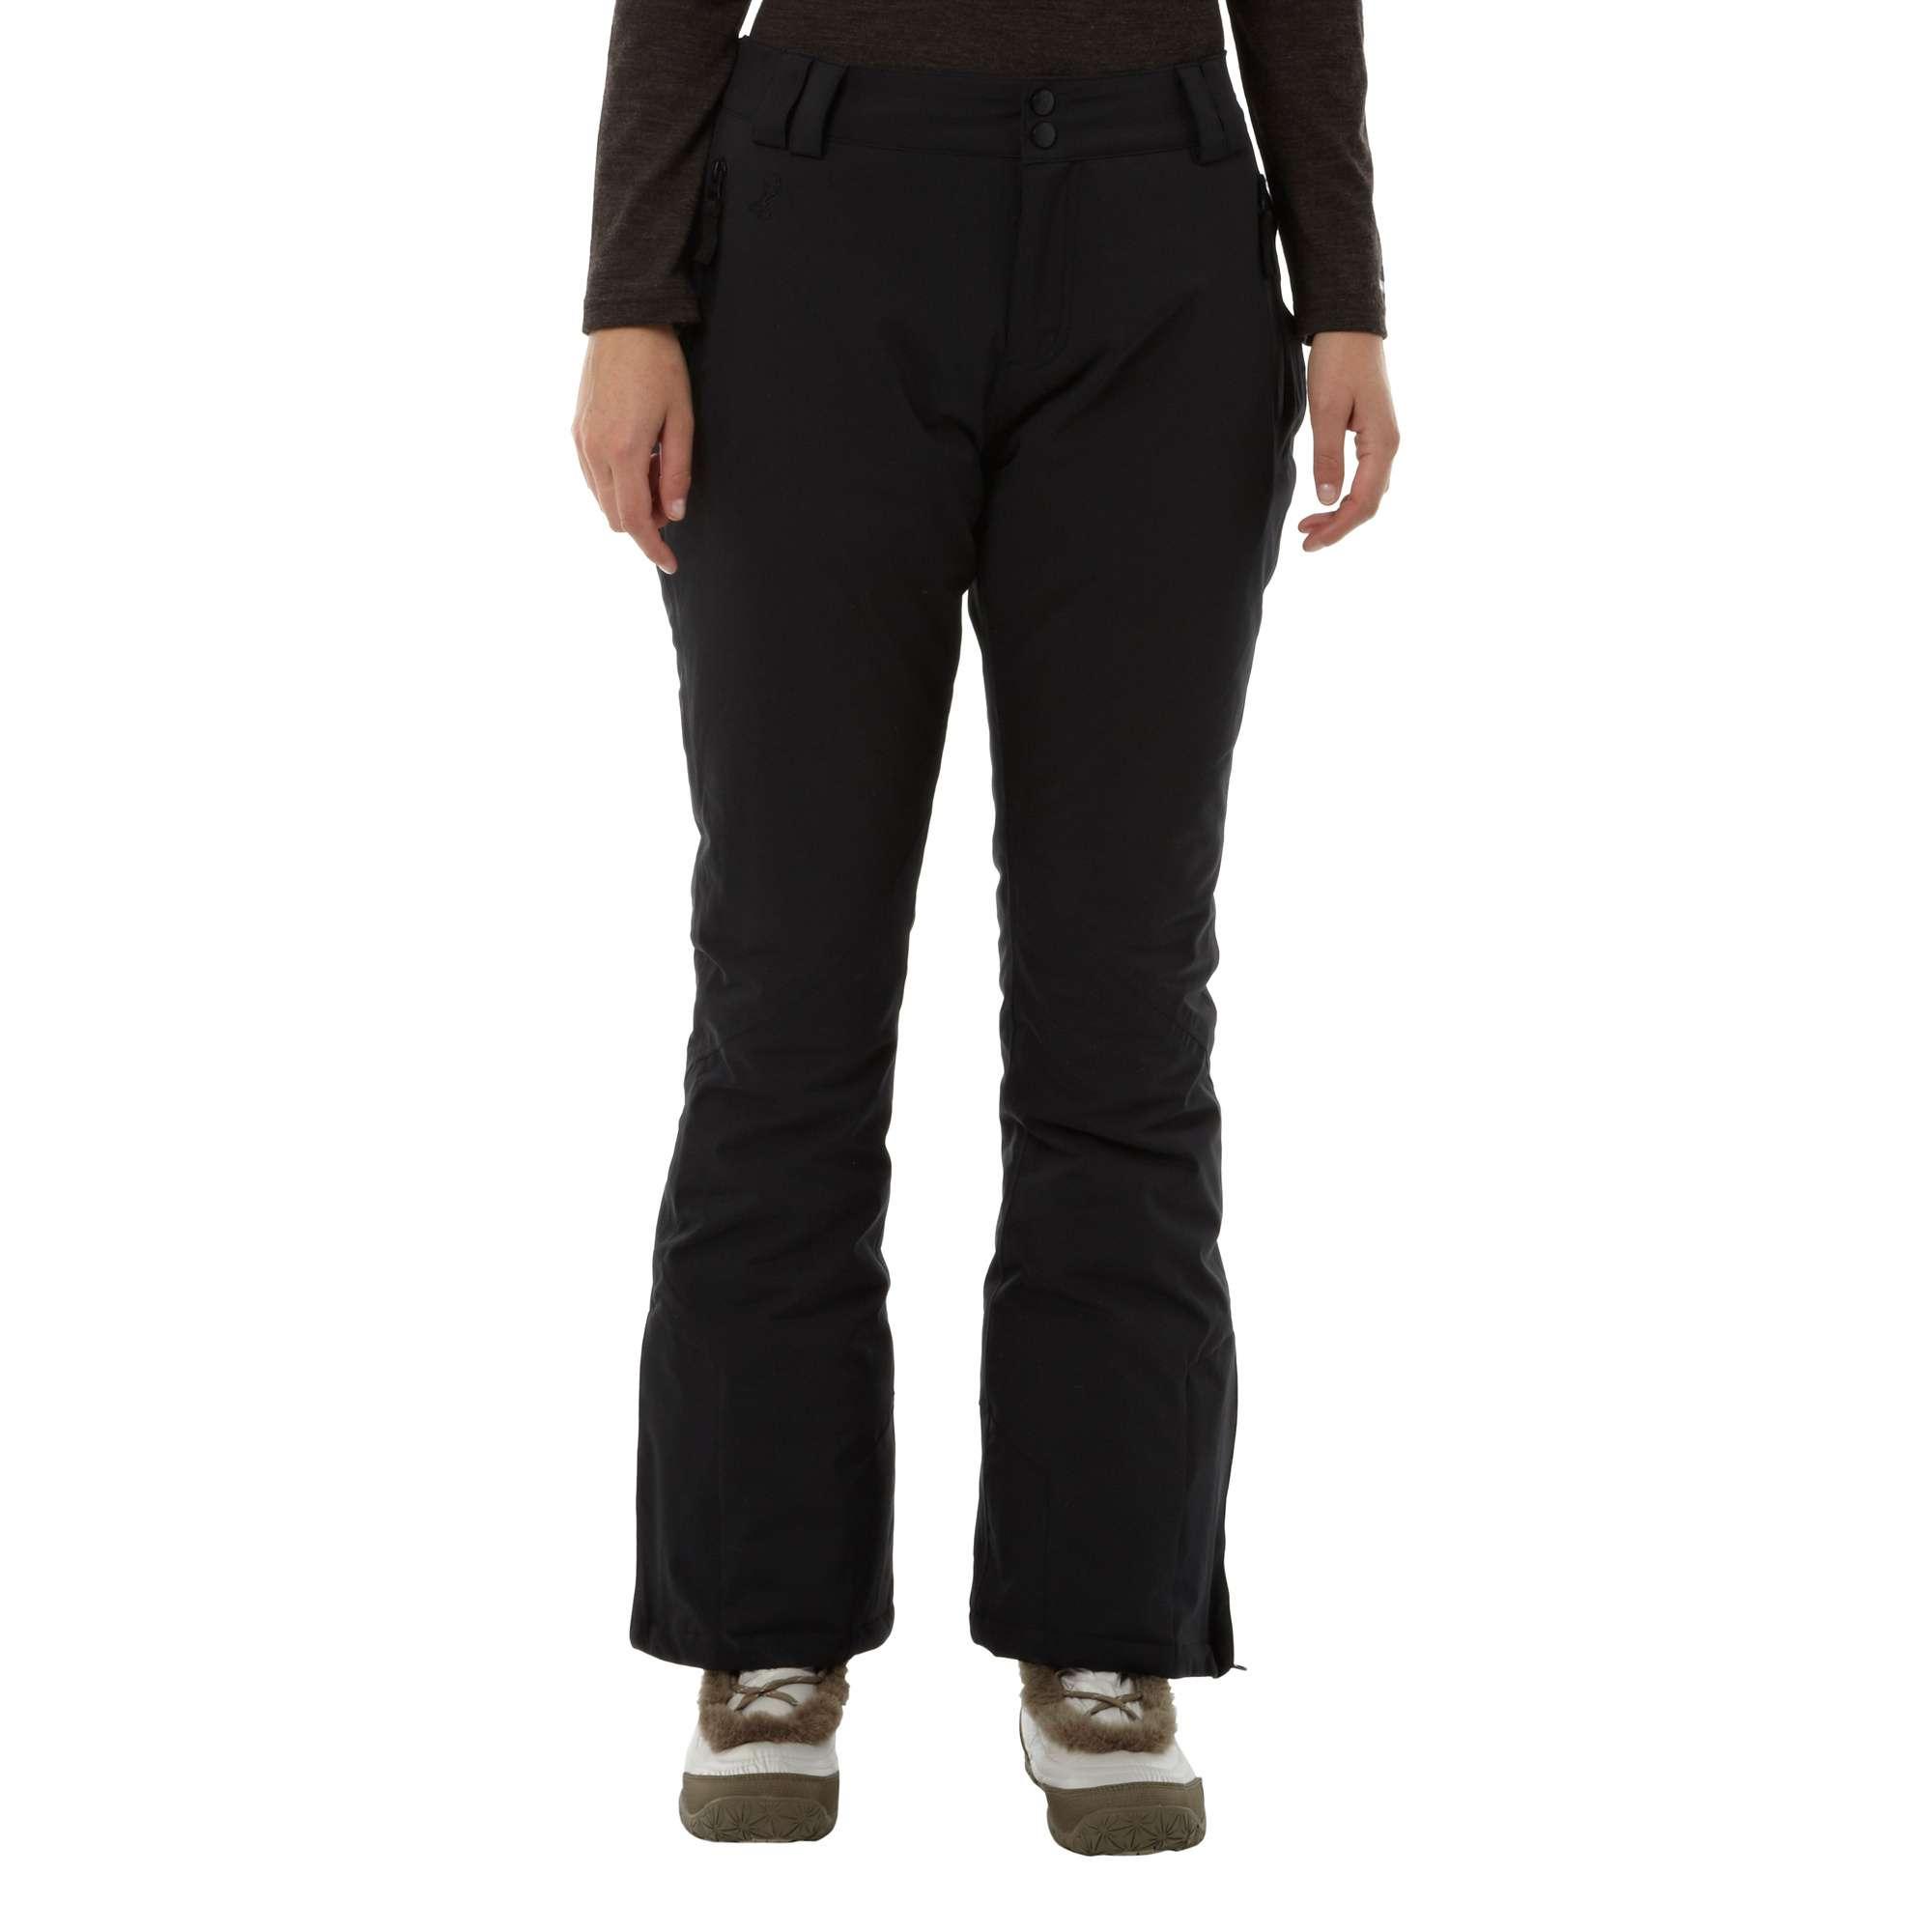 ALPINE Women's Pro Boundary Active Ski Pants